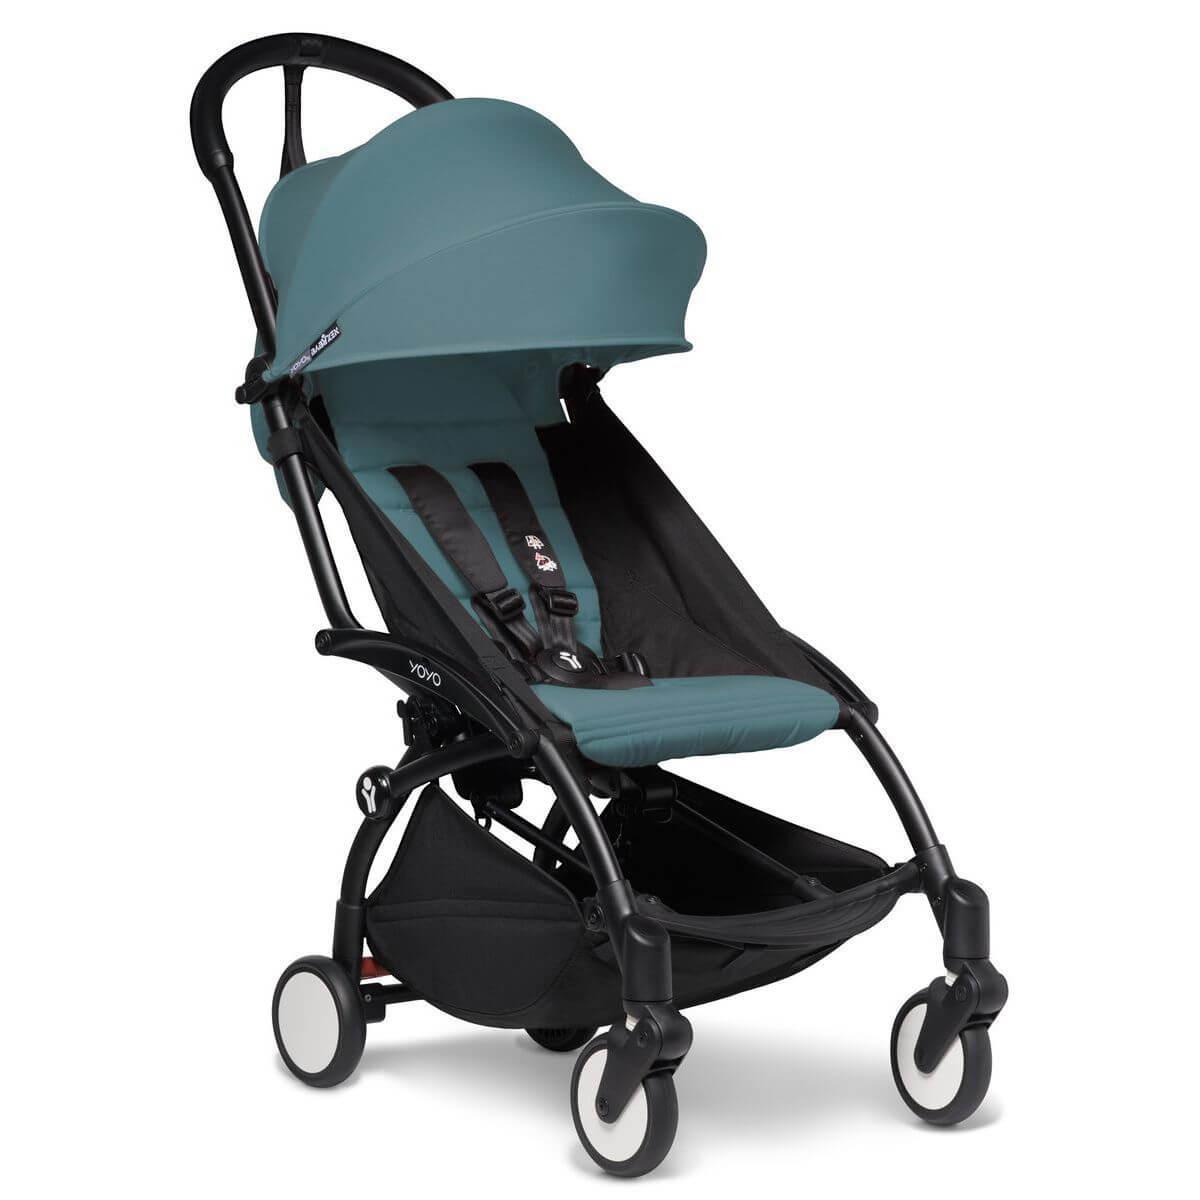 Kinderwagen BABYZEN YOYO²  all-in-one Wanne/Autositz/6+ schwartz-aqua